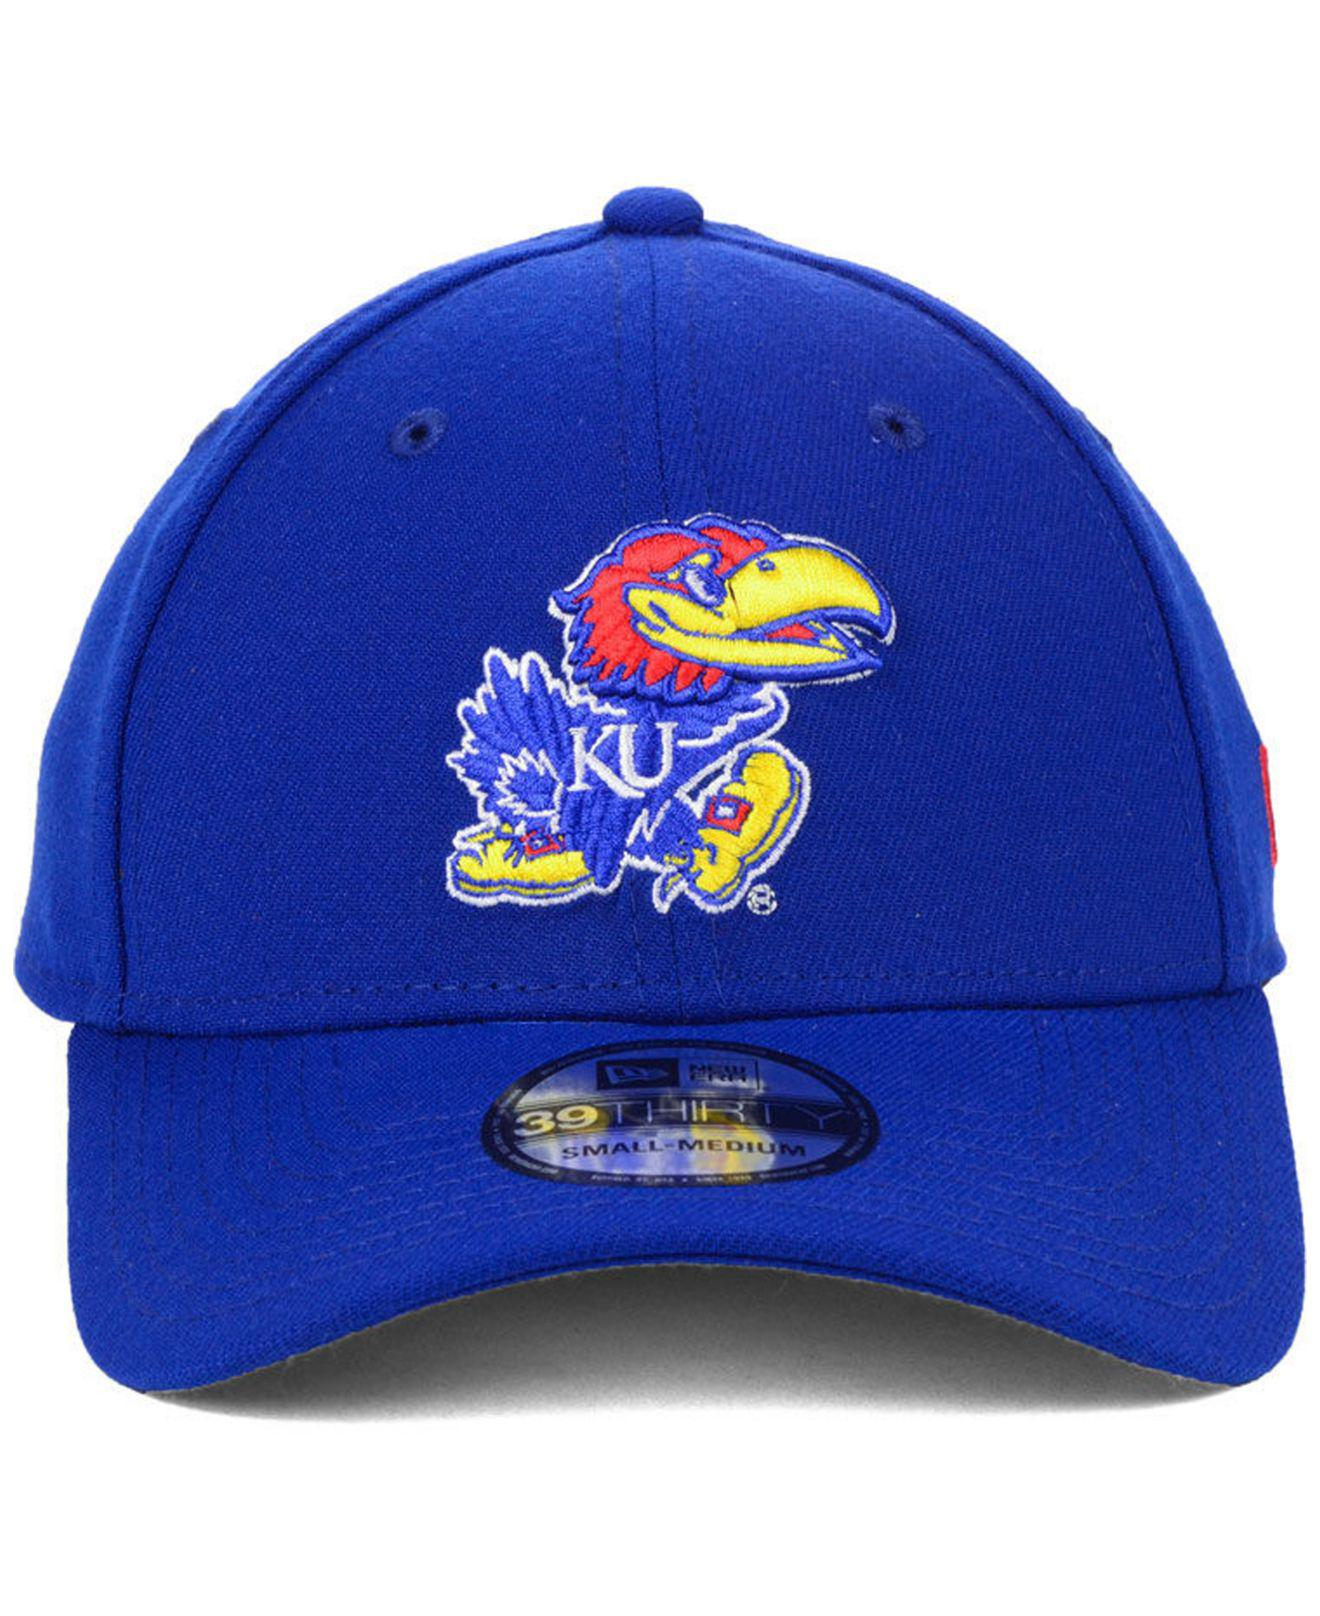 buy online ab577 ab66a Lyst - Ktz Kansas Jayhawks College Classic 39thirty Cap in Blue for Men